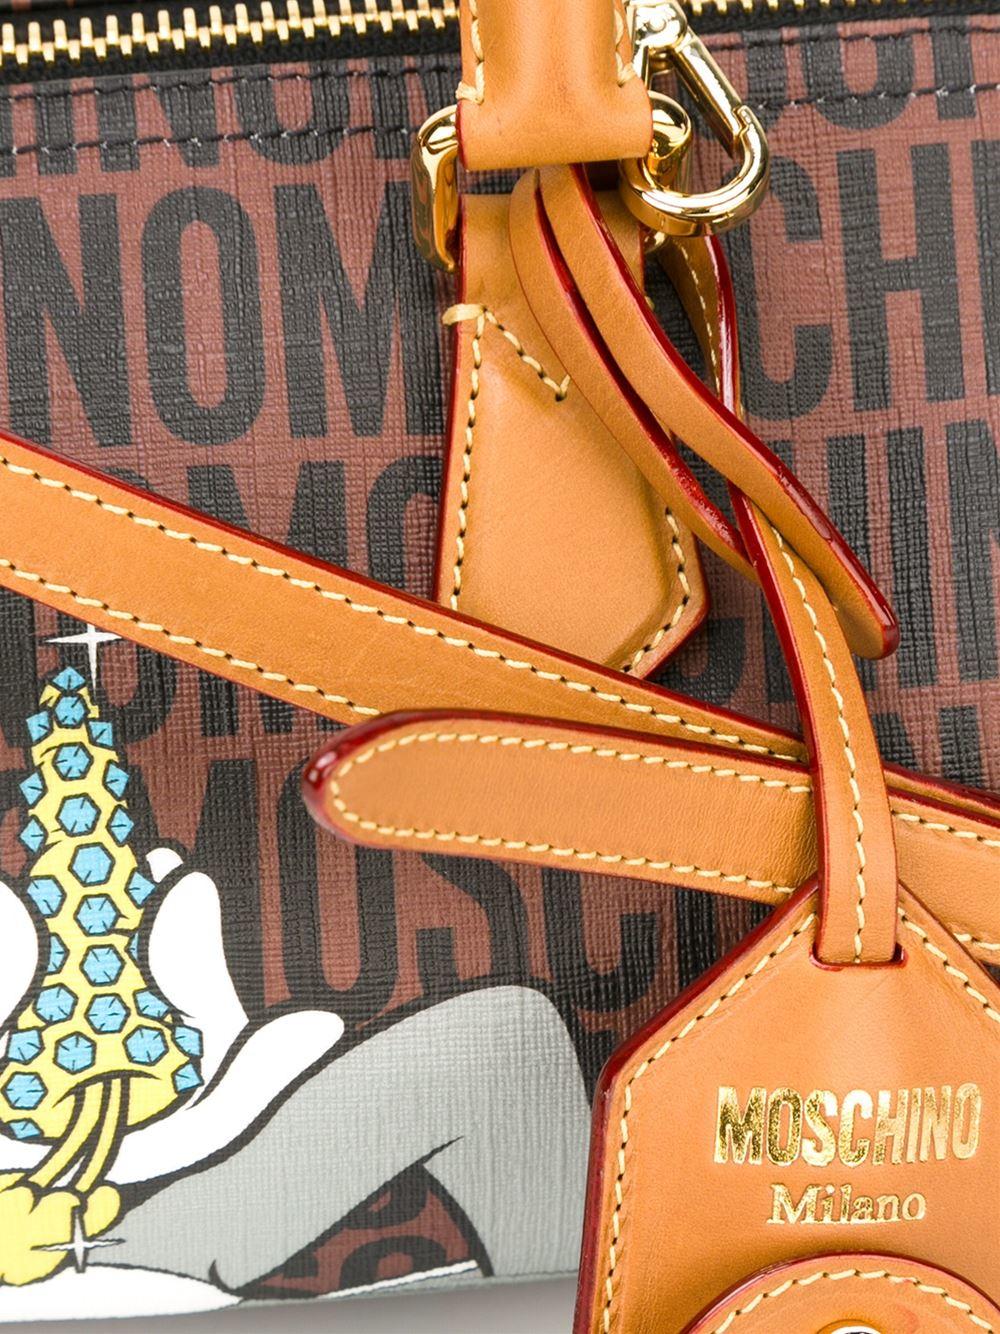 ba625ae1aa9 Moschino Bugs Bunny Tote Bag - Lyst